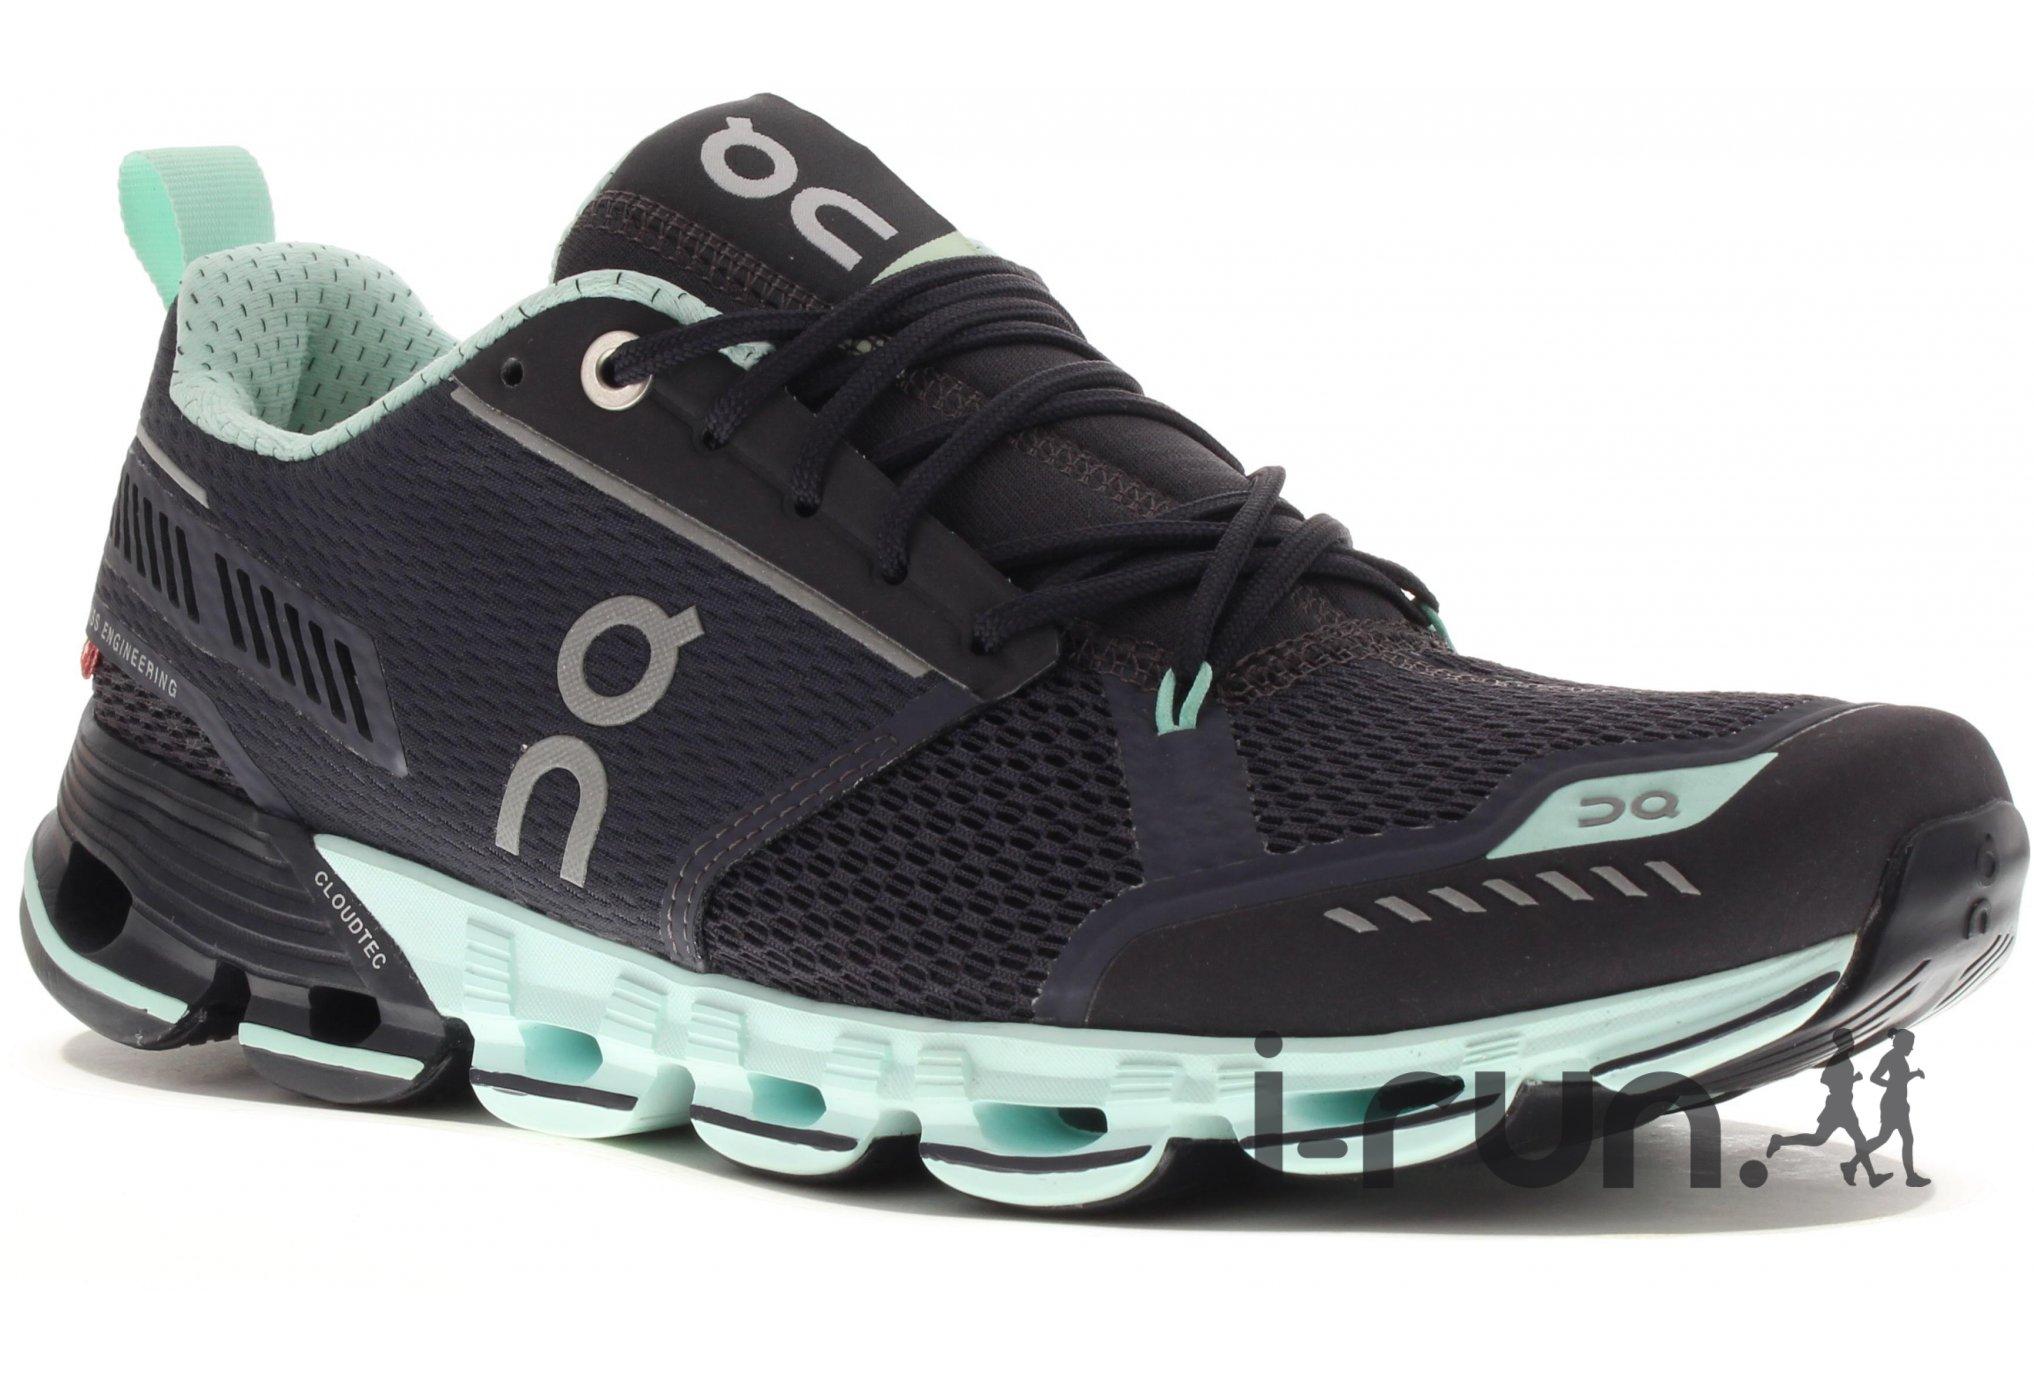 On running cloudflyer w chaussures running femme